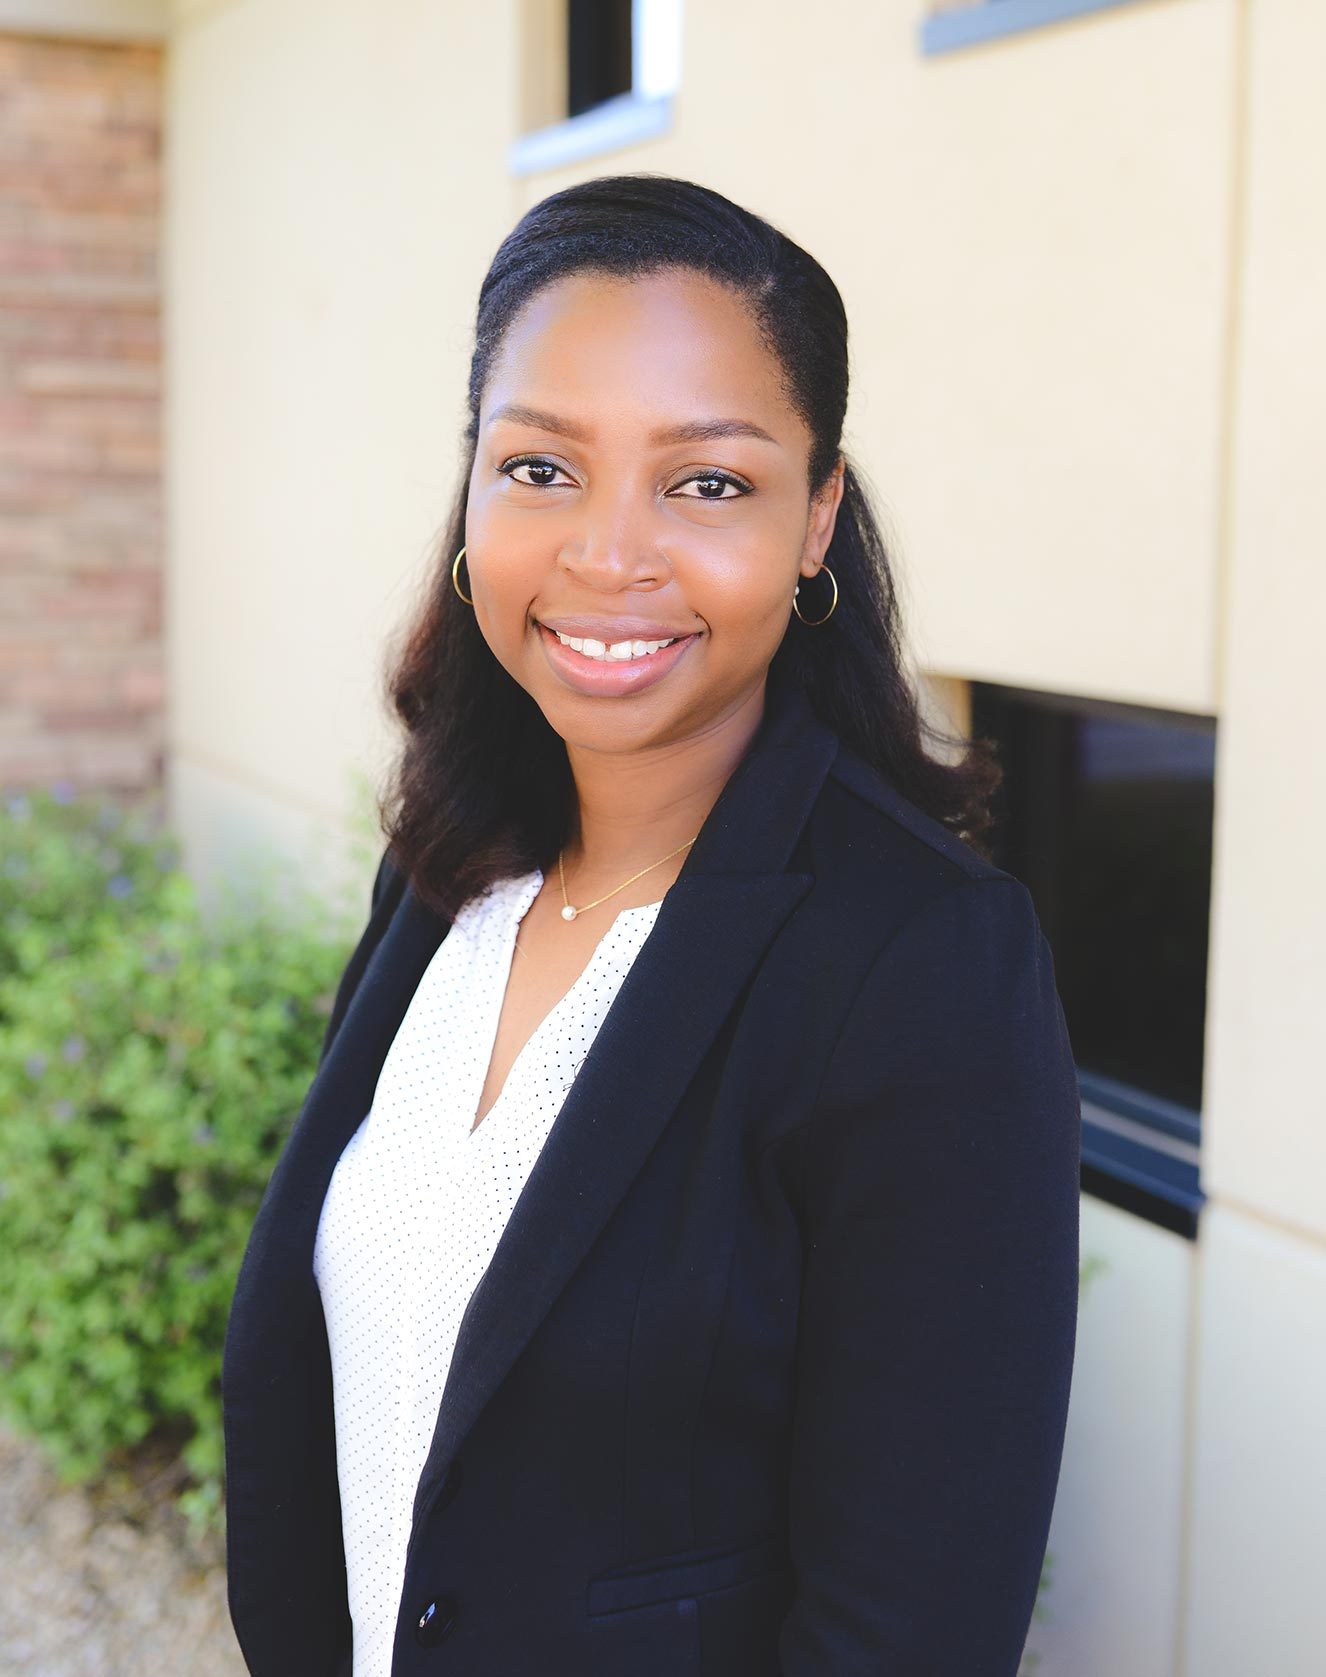 Tania Edwards, Au.D., CCC-A